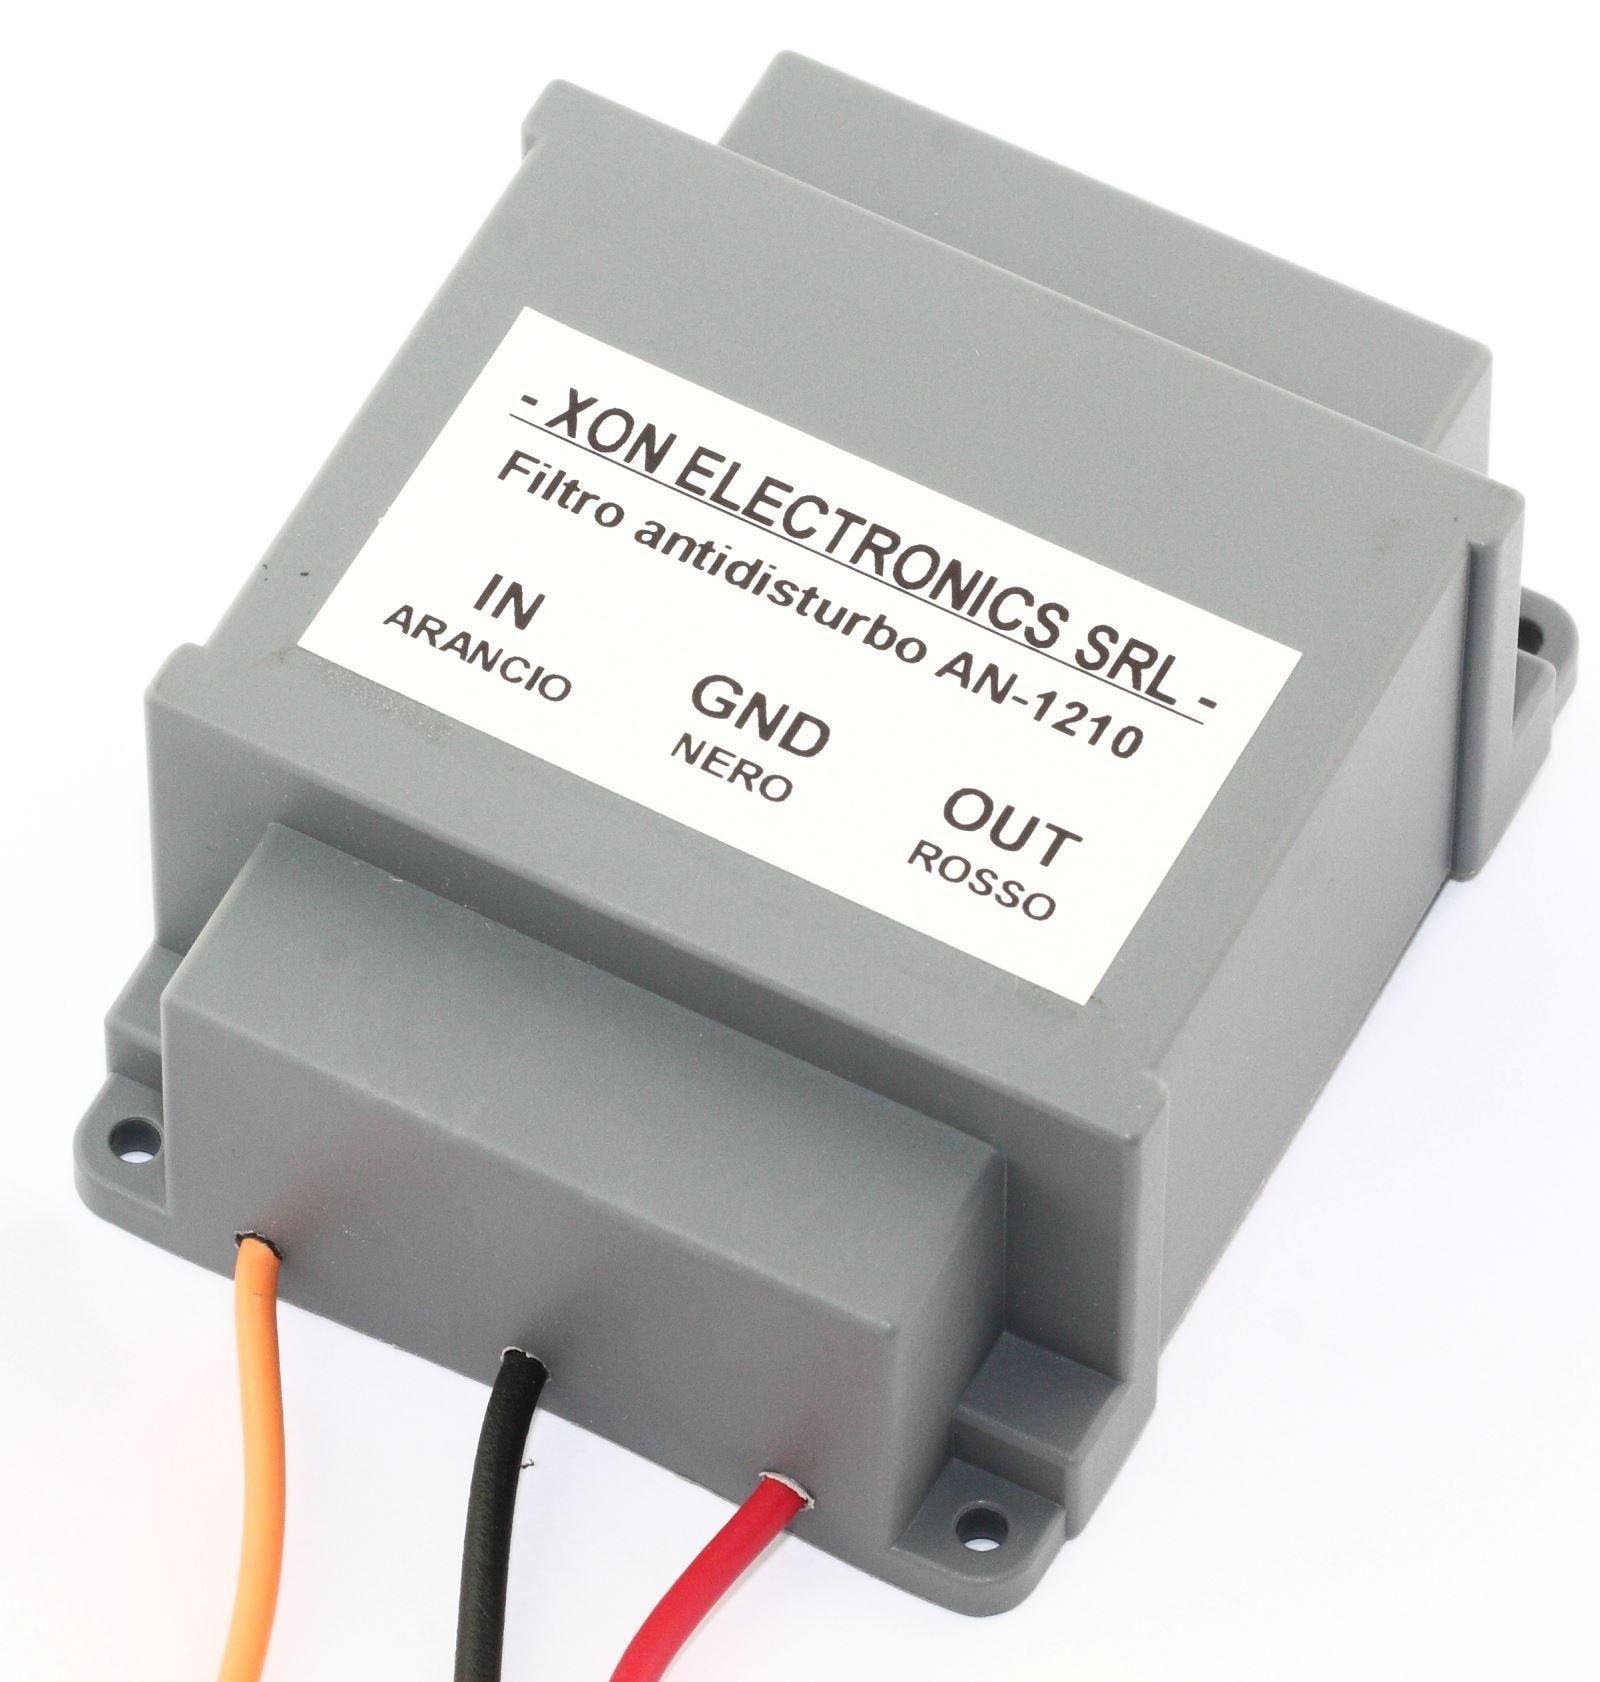 Noise Filter An 1210 Xon Electronics Dispositivi E Componenti Circuit Picture Of